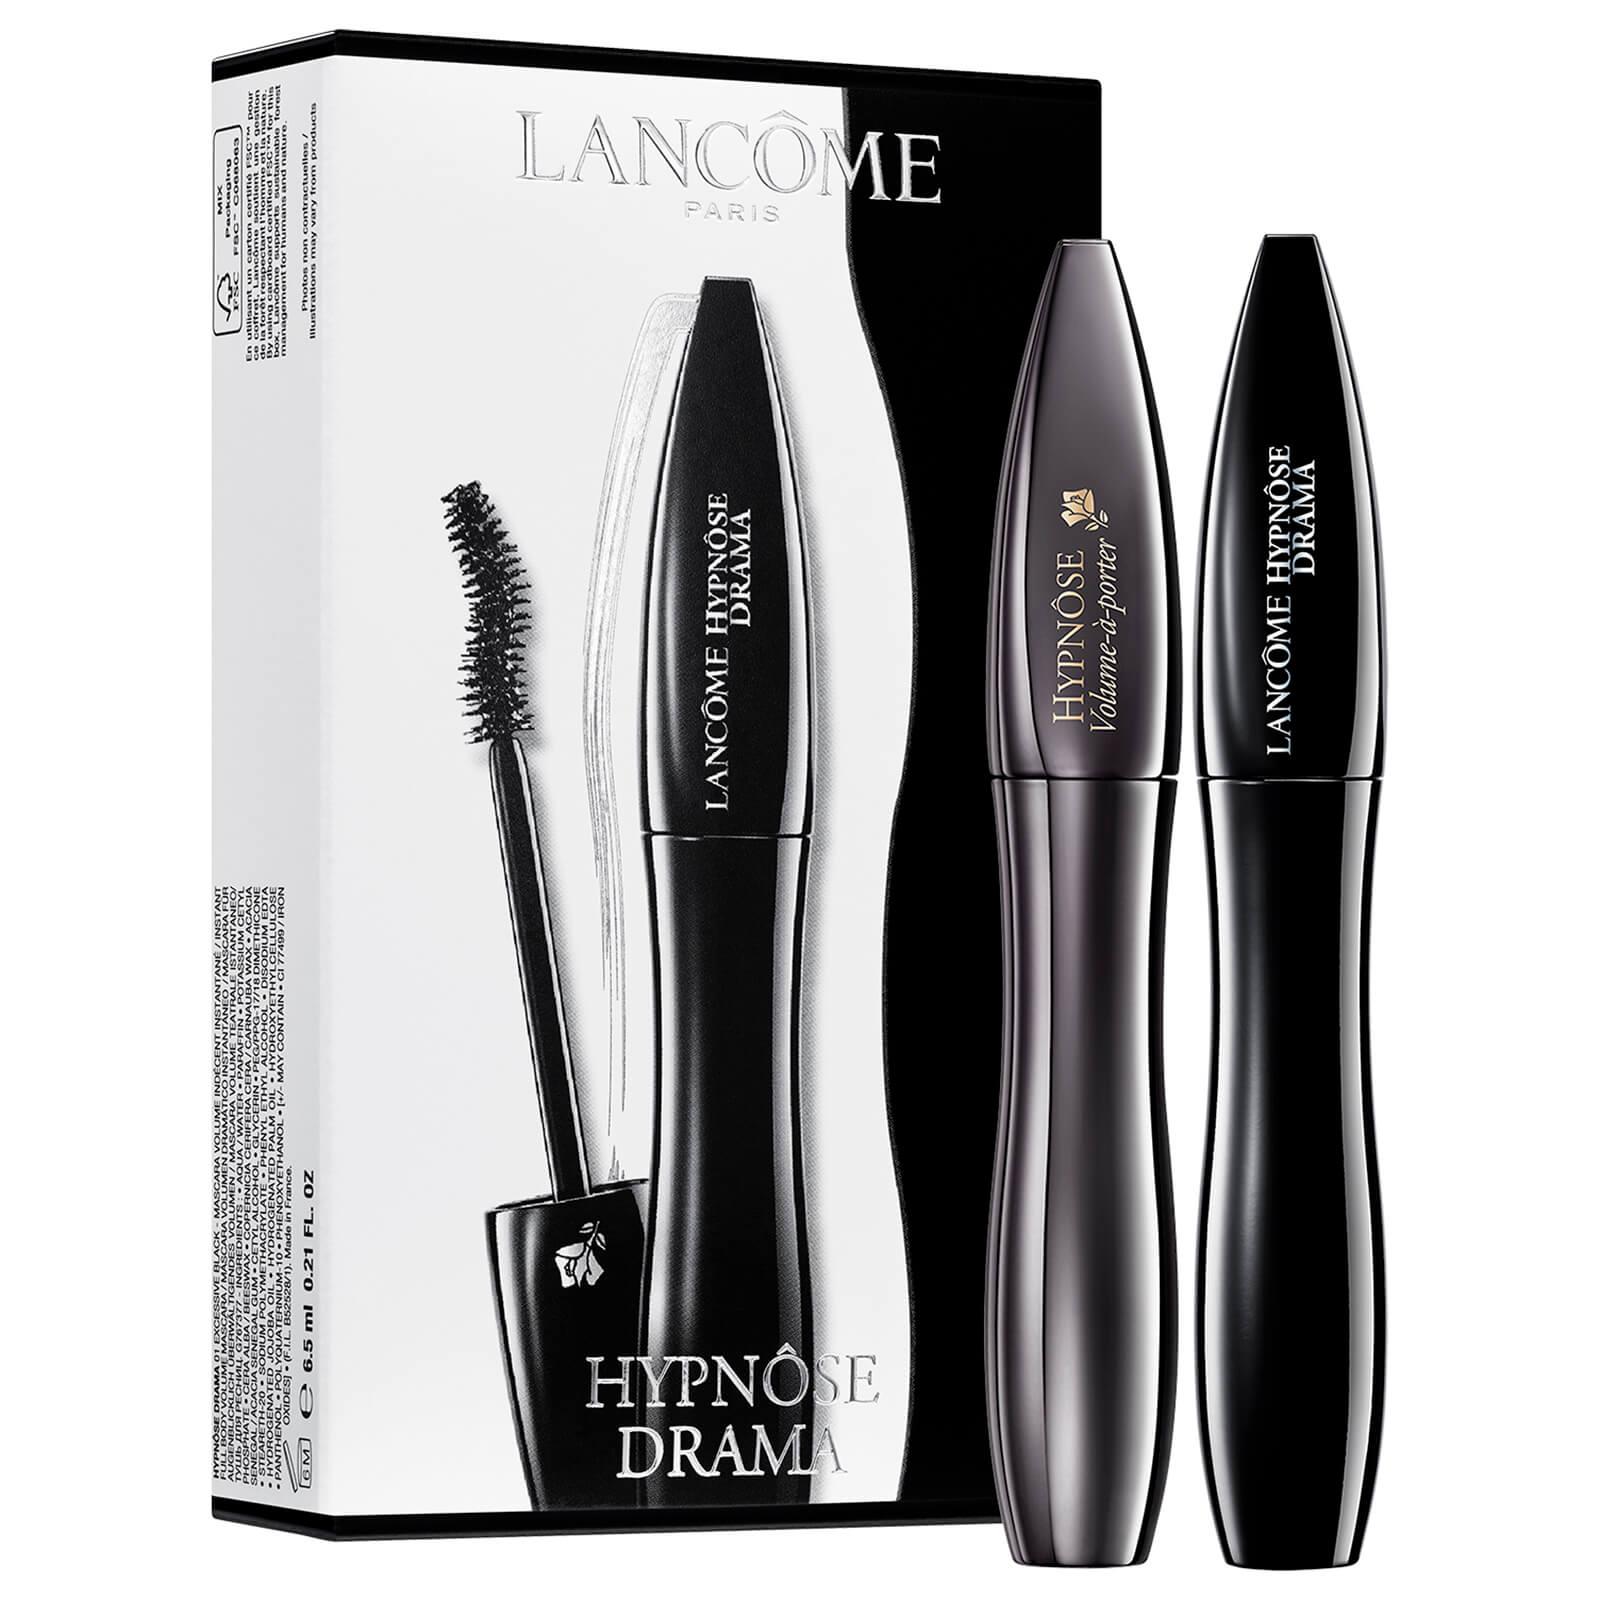 Lancome Limited Edition Hypnose Mascara Set